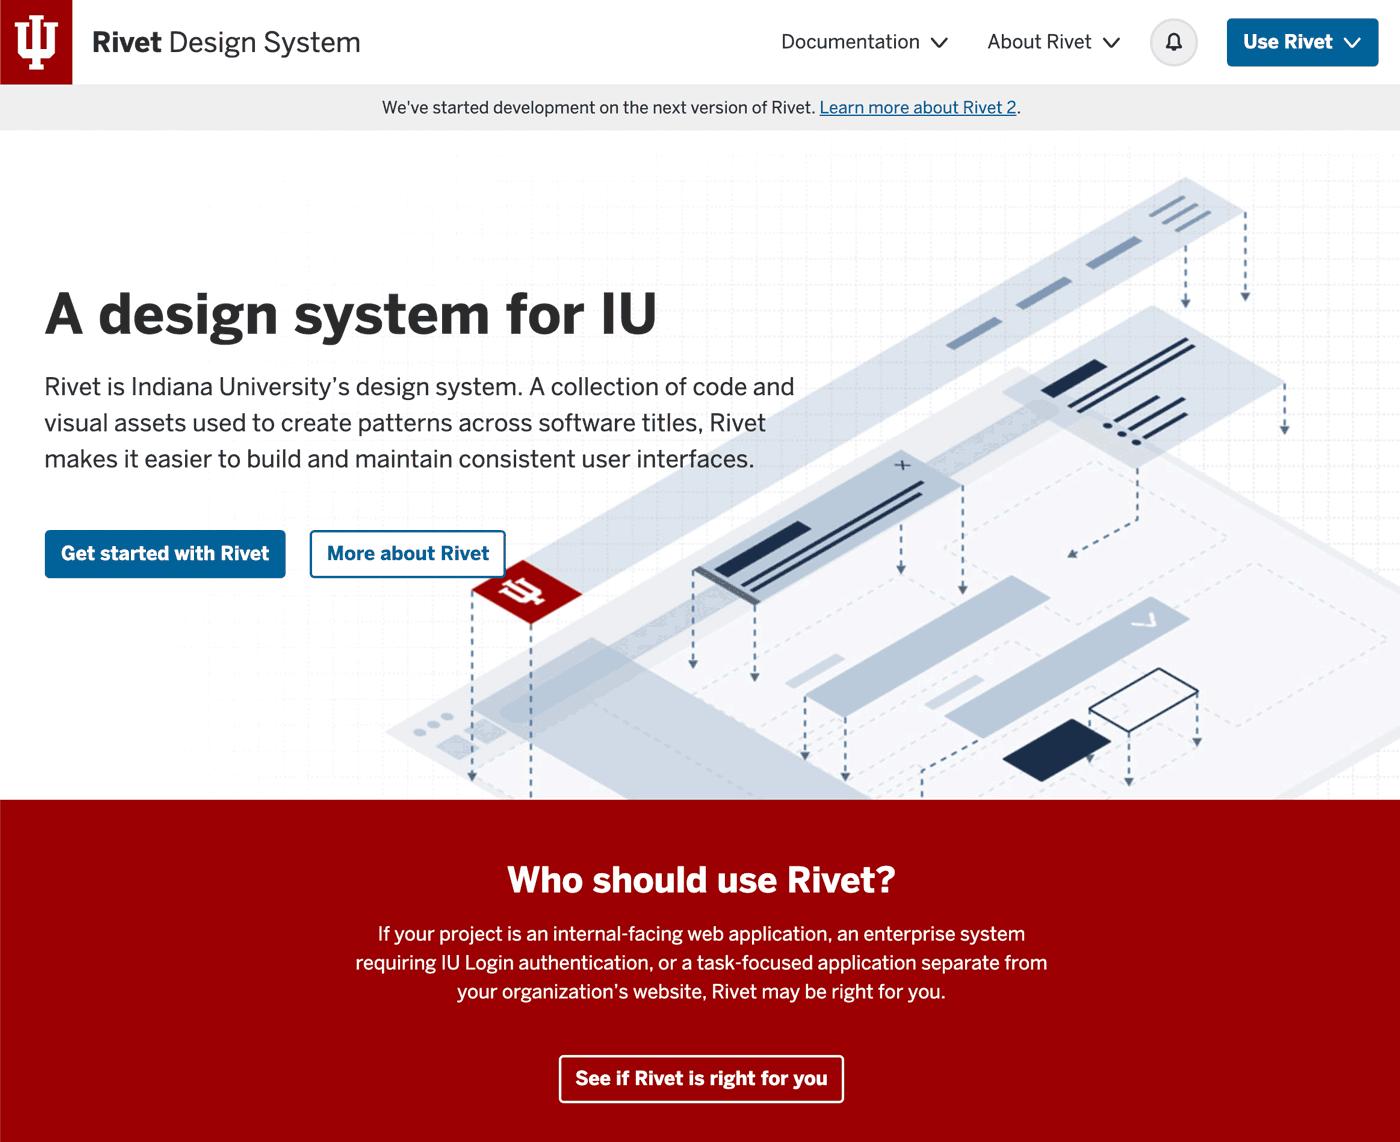 screenshot of Indiana University's design system